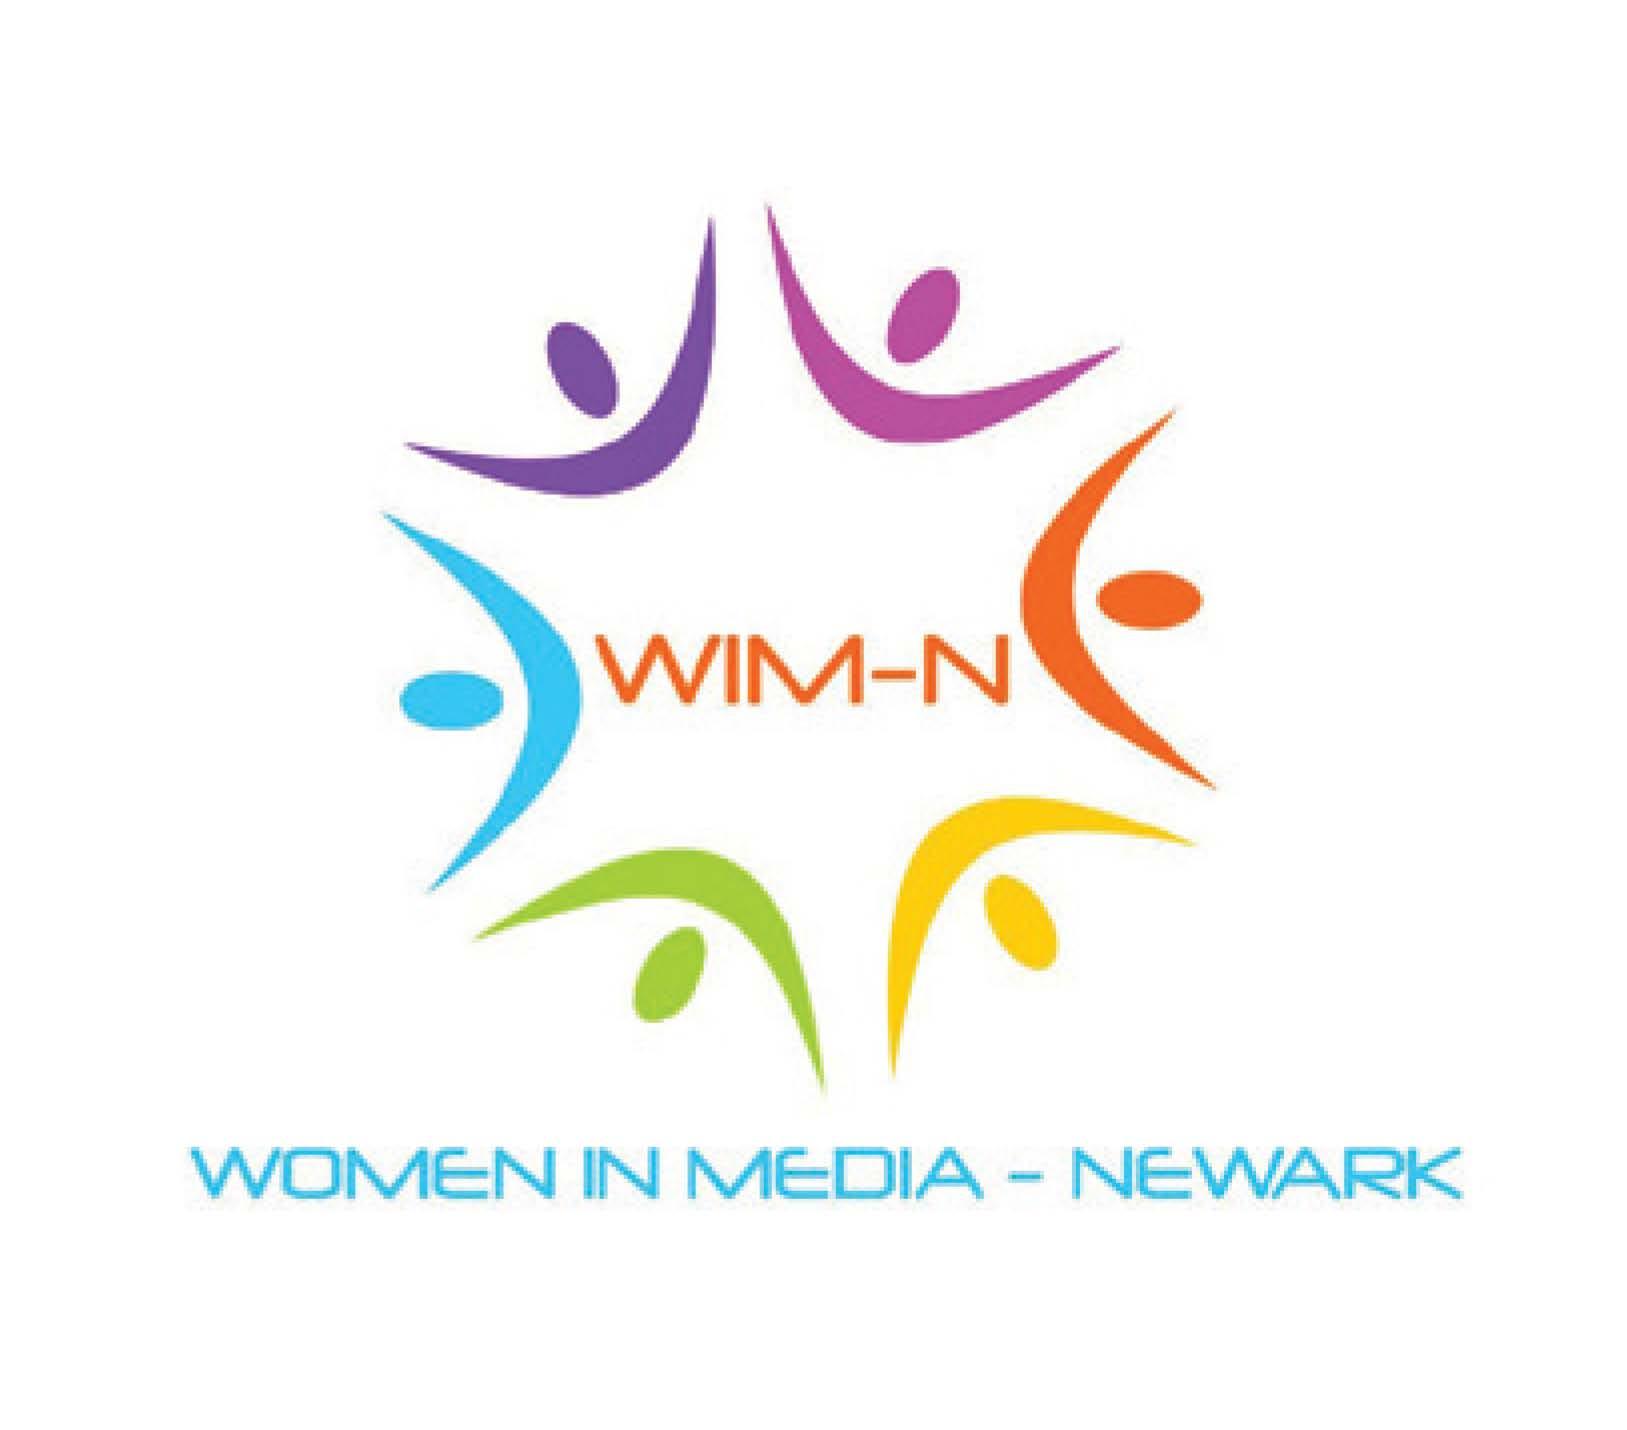 Women in Media - Newark logo